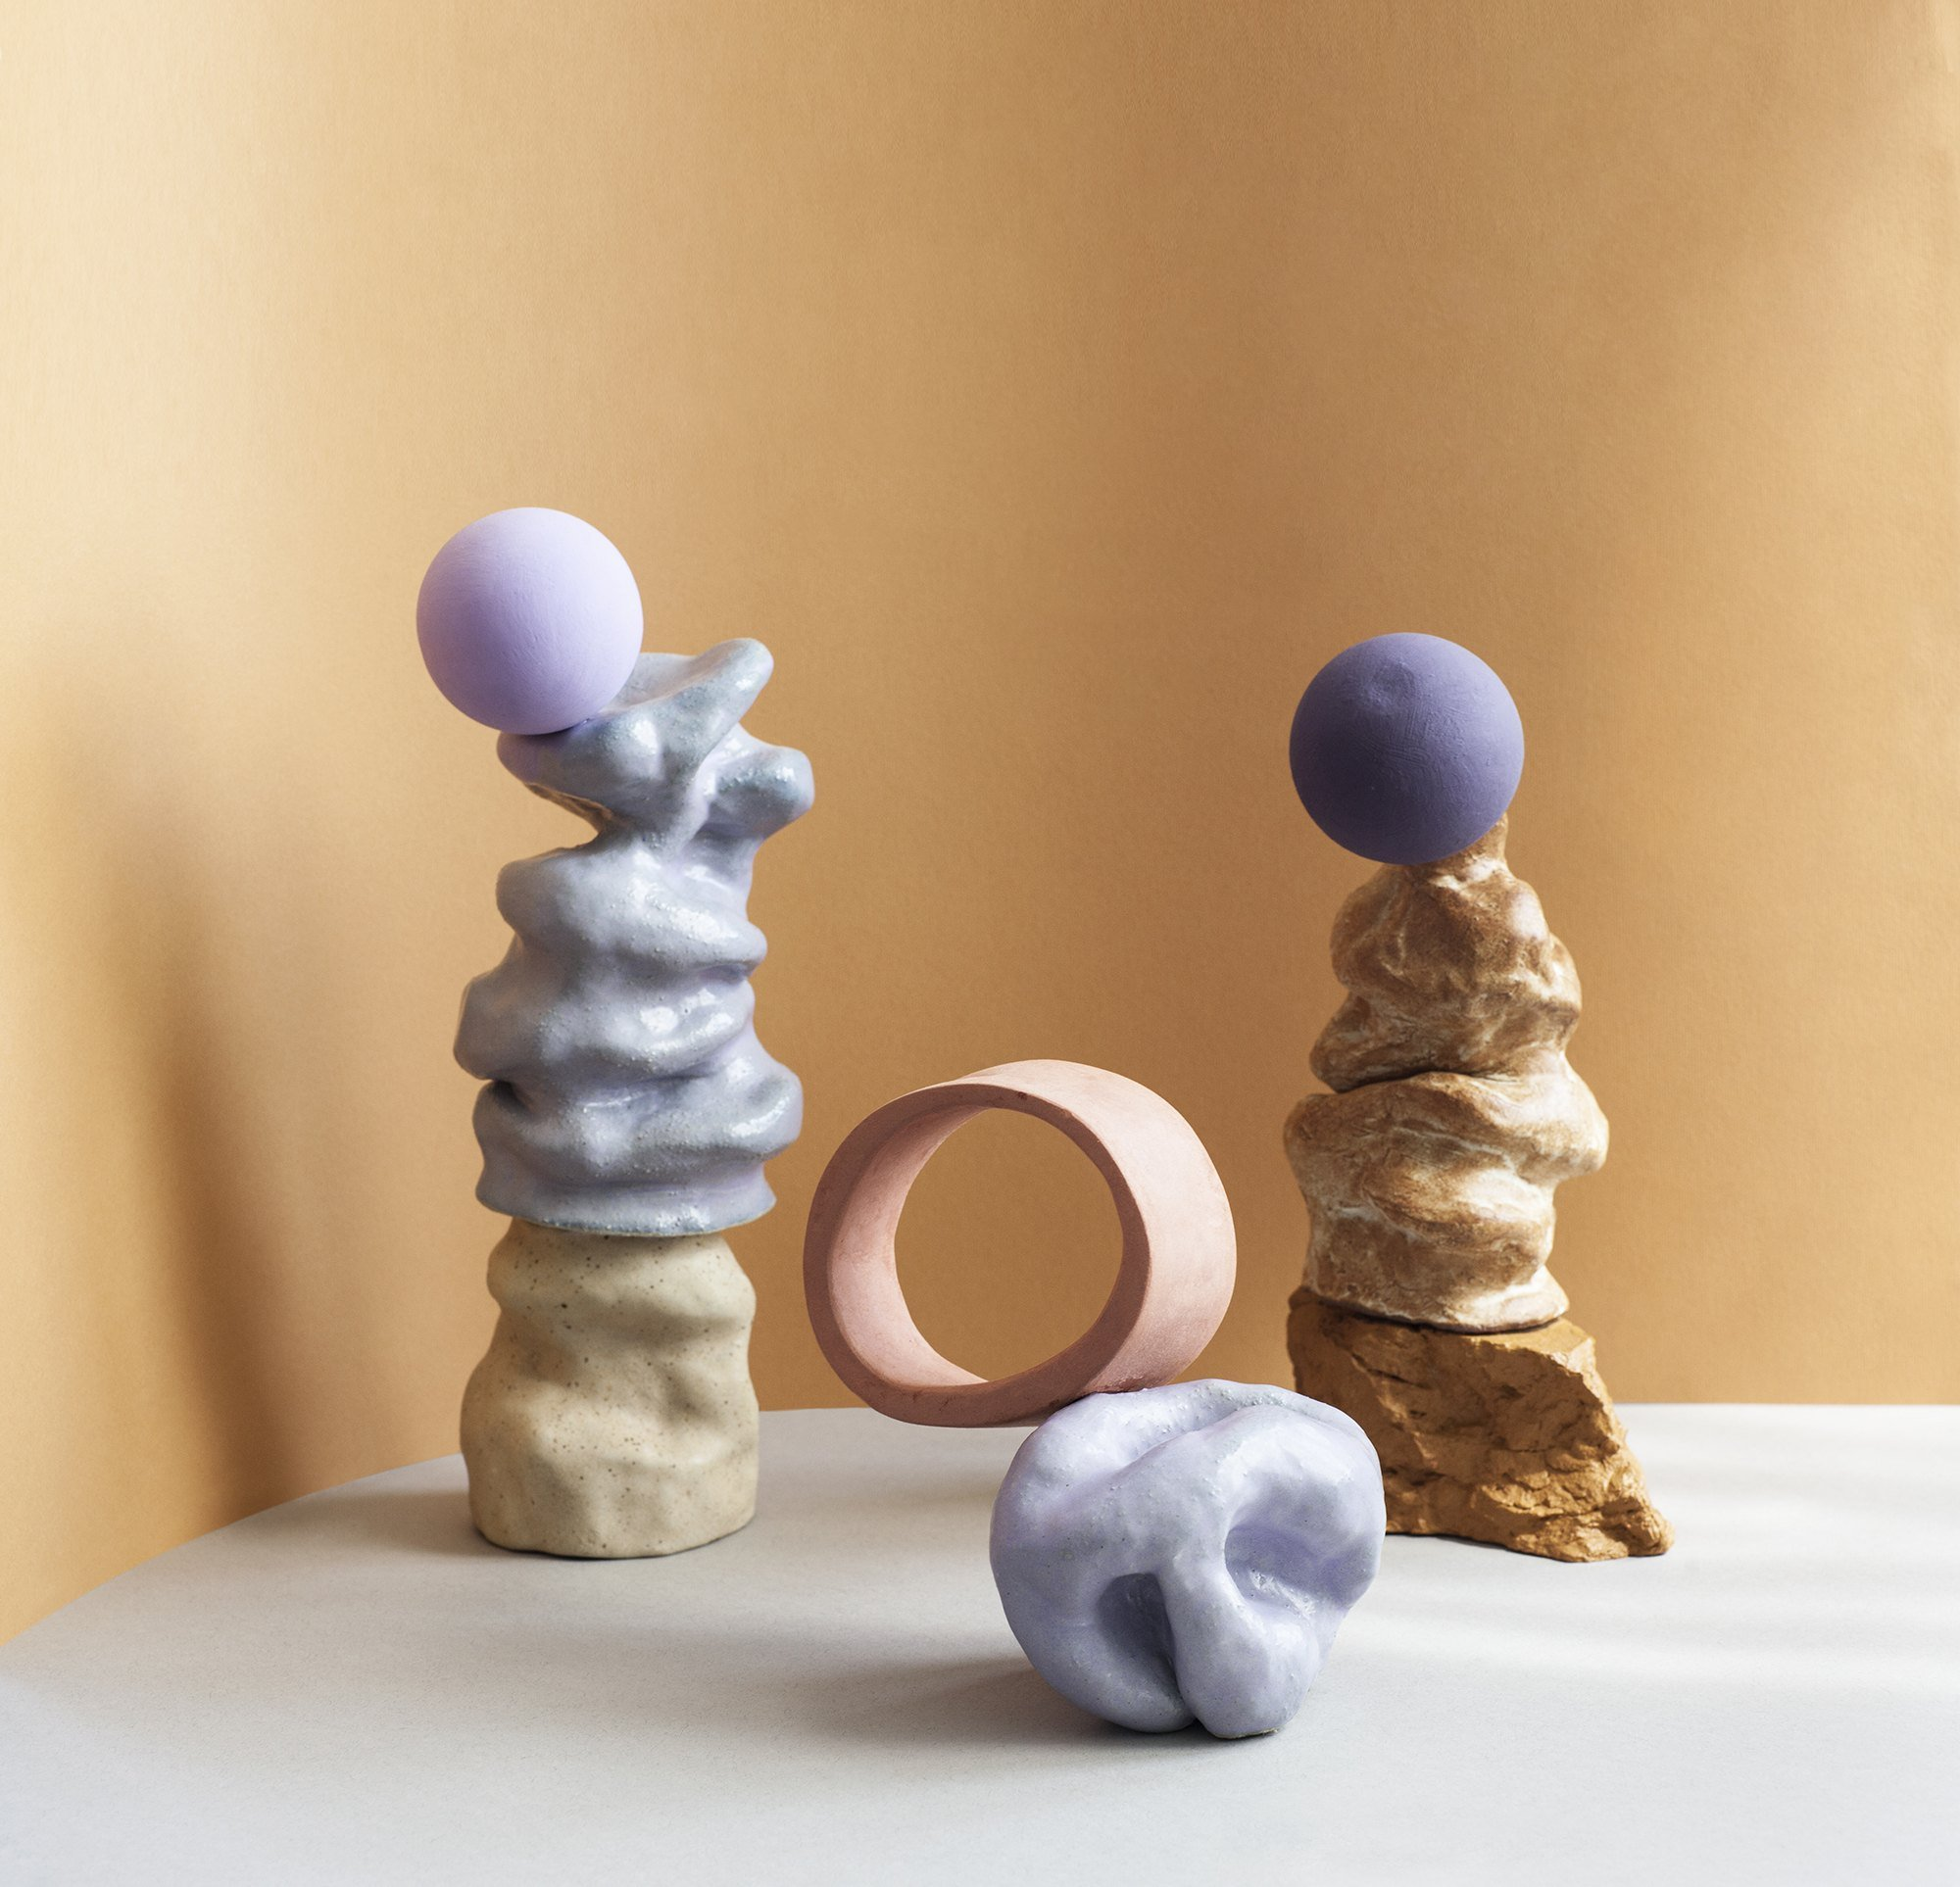 iGNANT-Art-Malou-Palmqvist-5